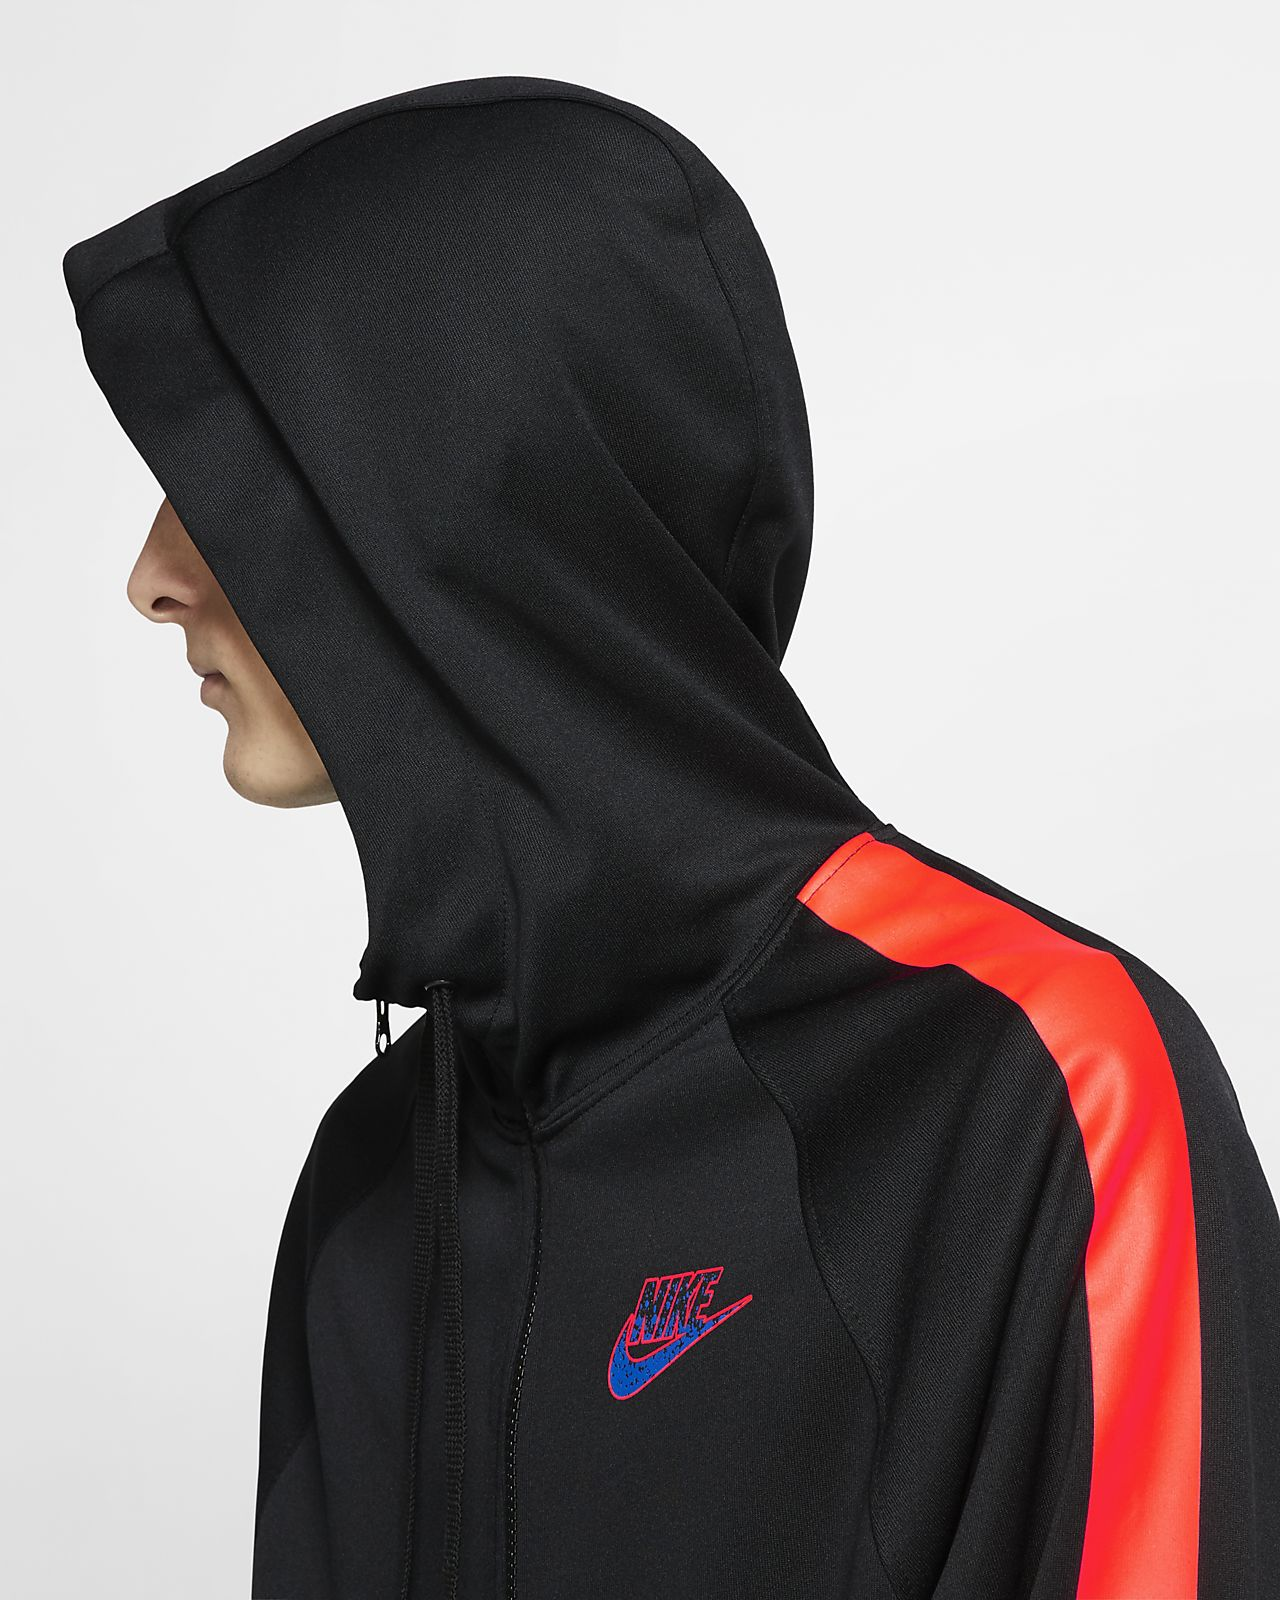 b522da98615 ... Ανδρική μπλούζα με κουκούλα και φερμουάρ στο μισό μήκος Nike Sportswear